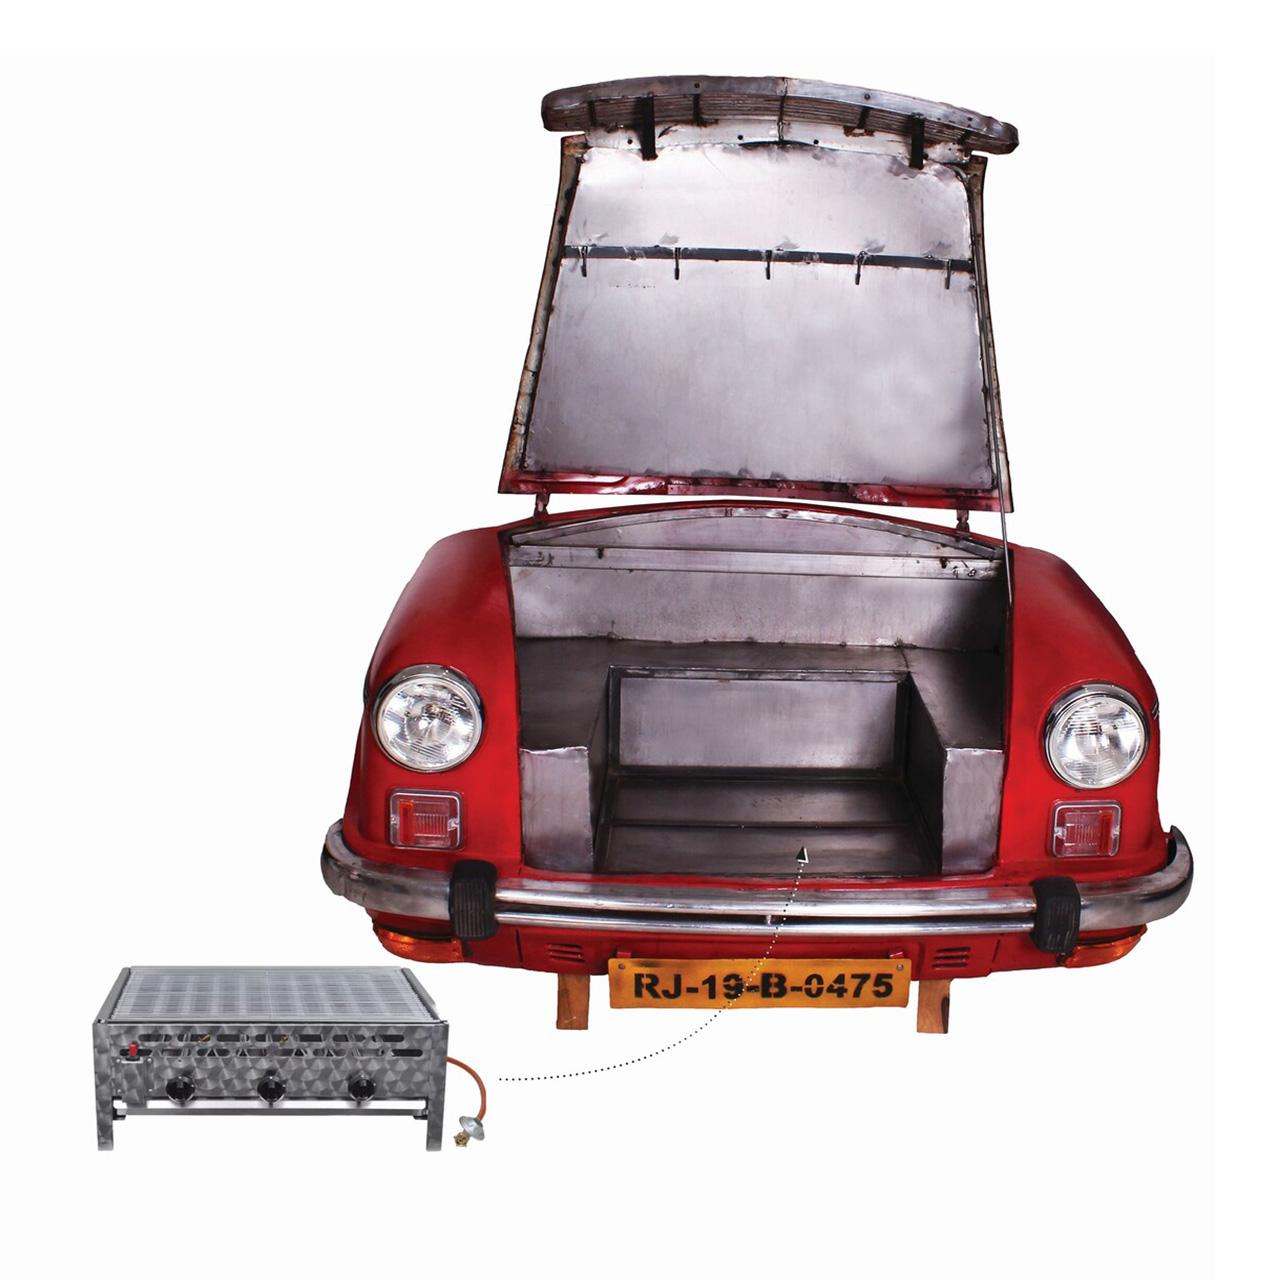 Grillwagen Carbecue